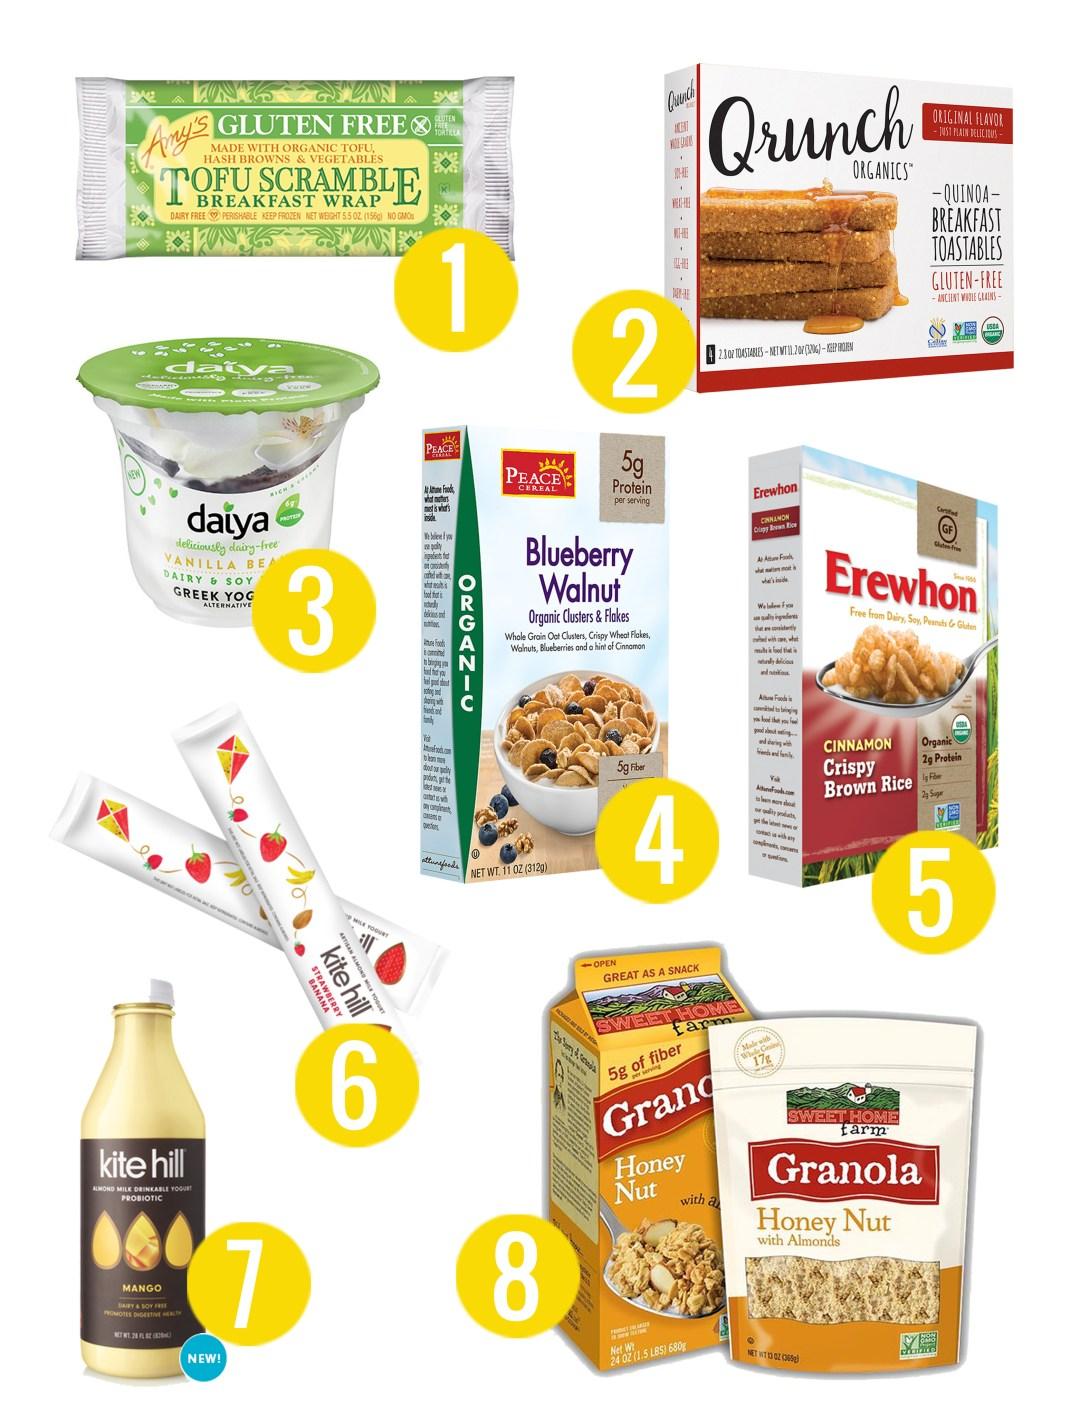 8 Vegetarian Grab & Go Breakfast Ideas